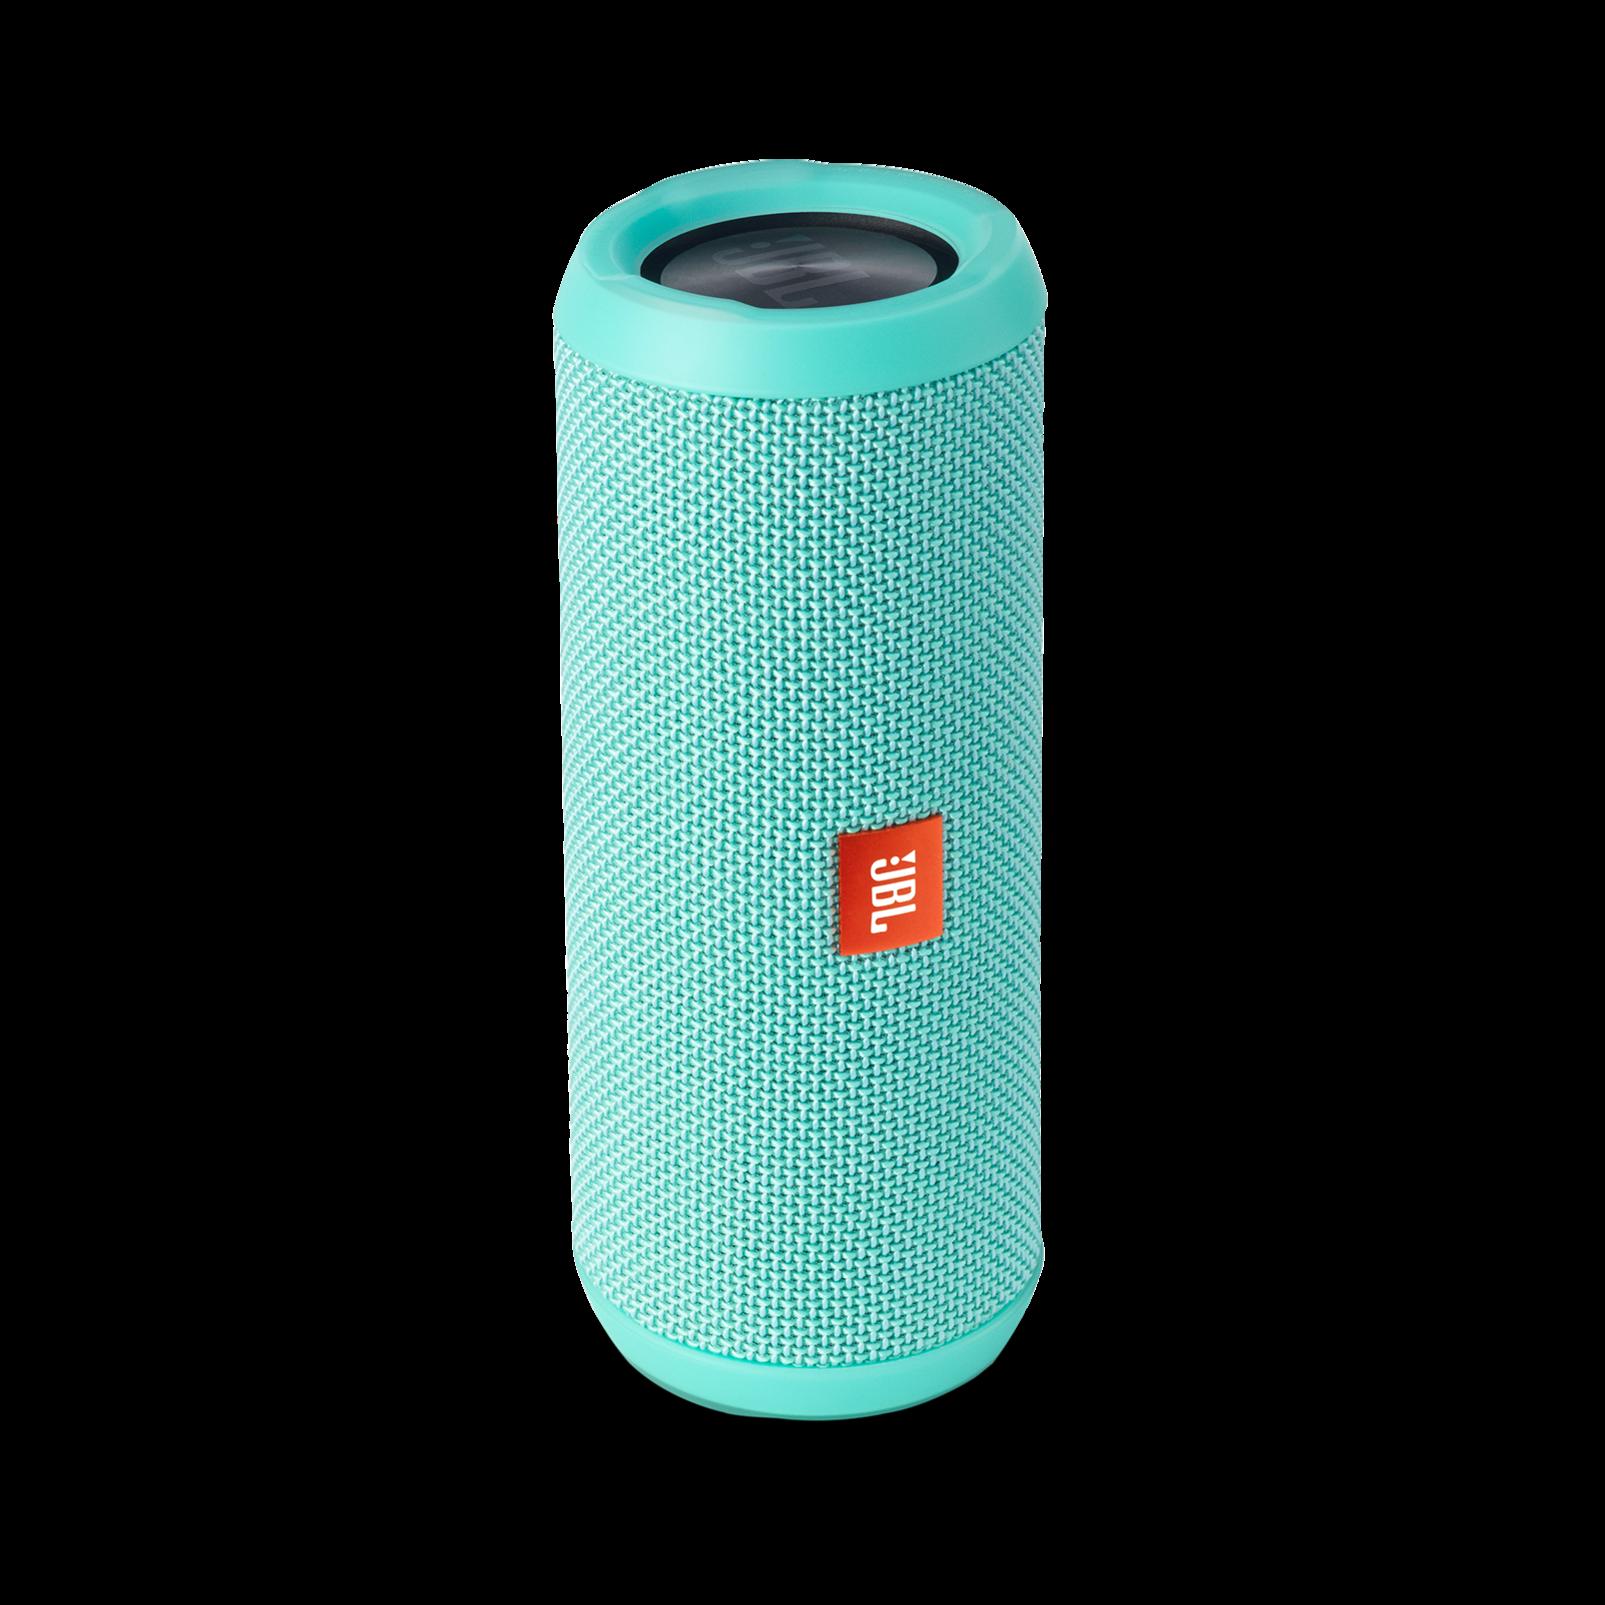 JBL Flip 3 - Teal - Splashproof portable Bluetooth speaker with powerful sound and speakerphone technology - Detailshot 2